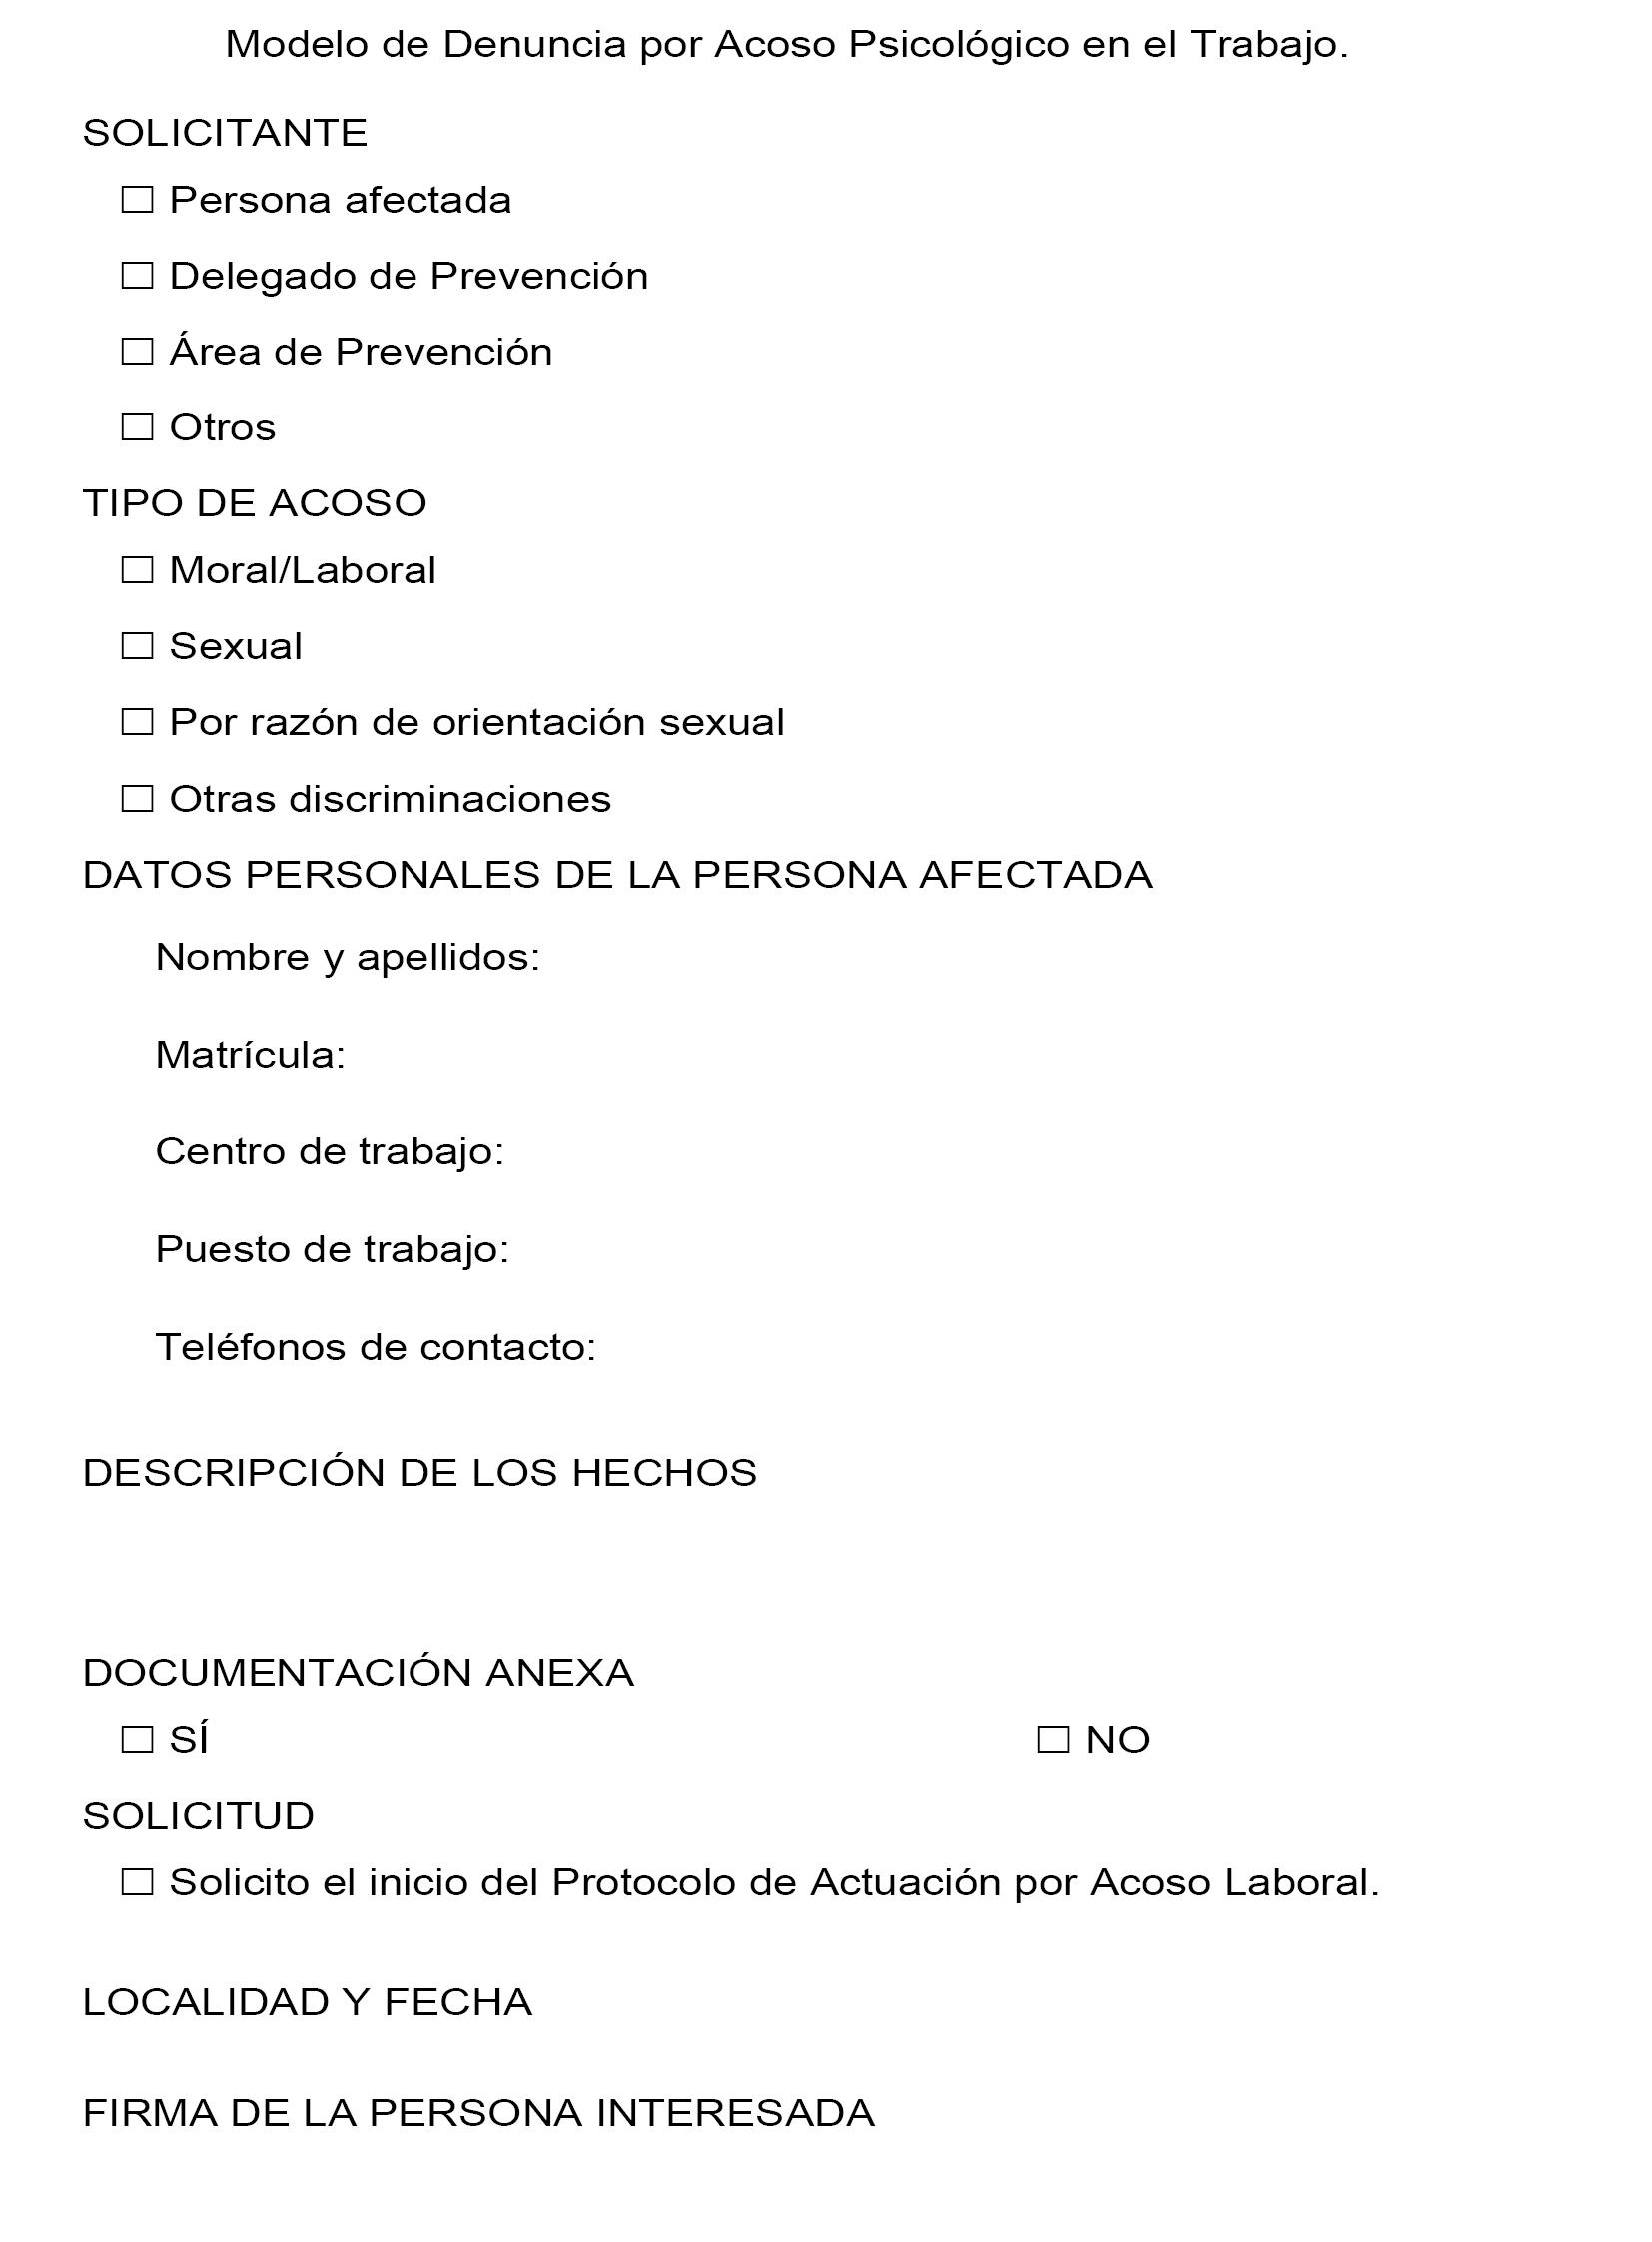 BOE.es - Documento BOE-A-2017-1001